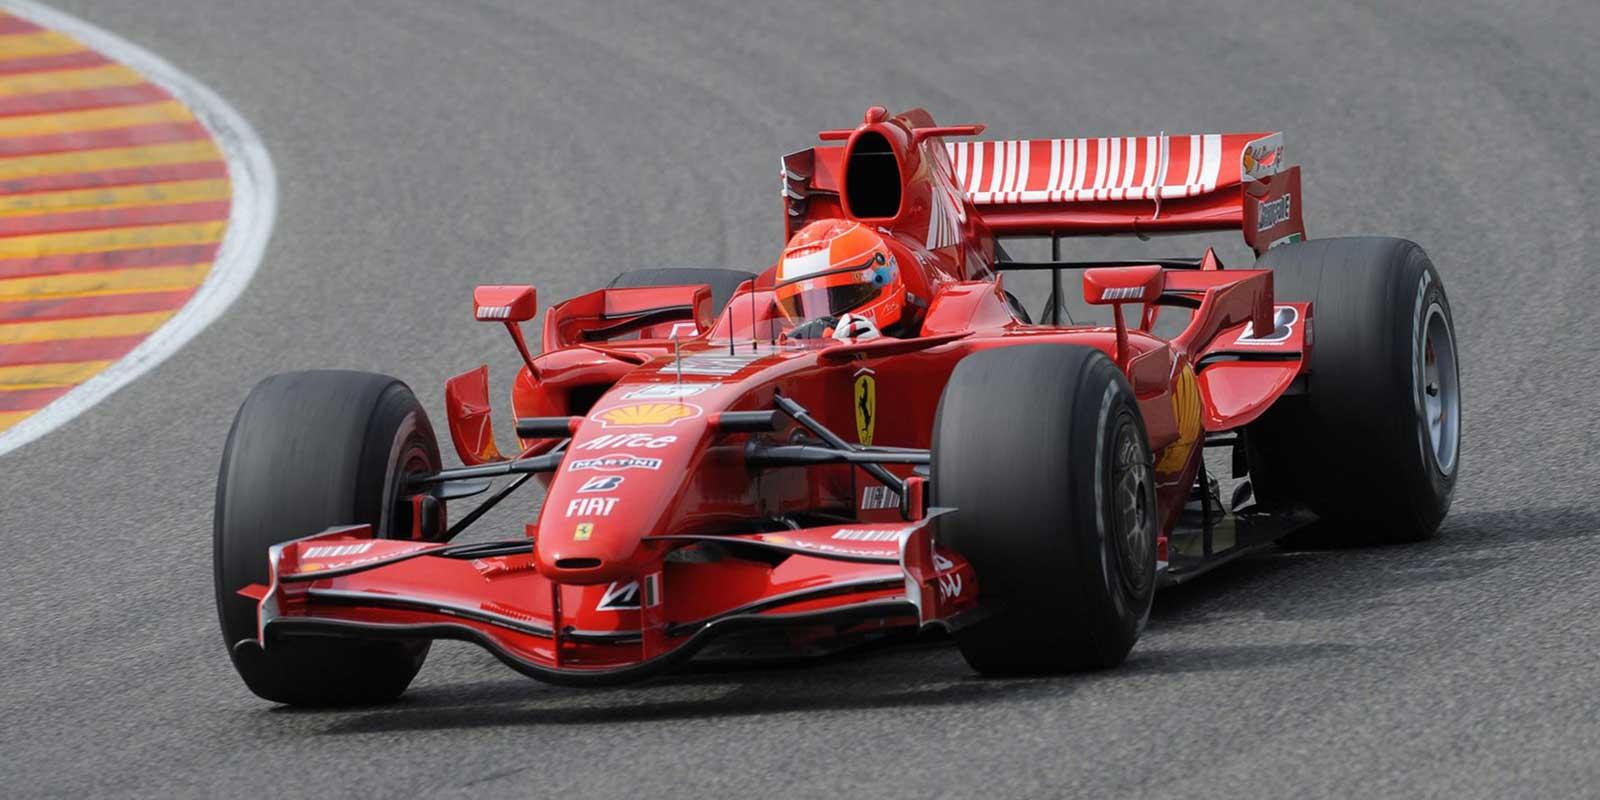 Michael Schumacher's F2001 Ferrari sold for $7m